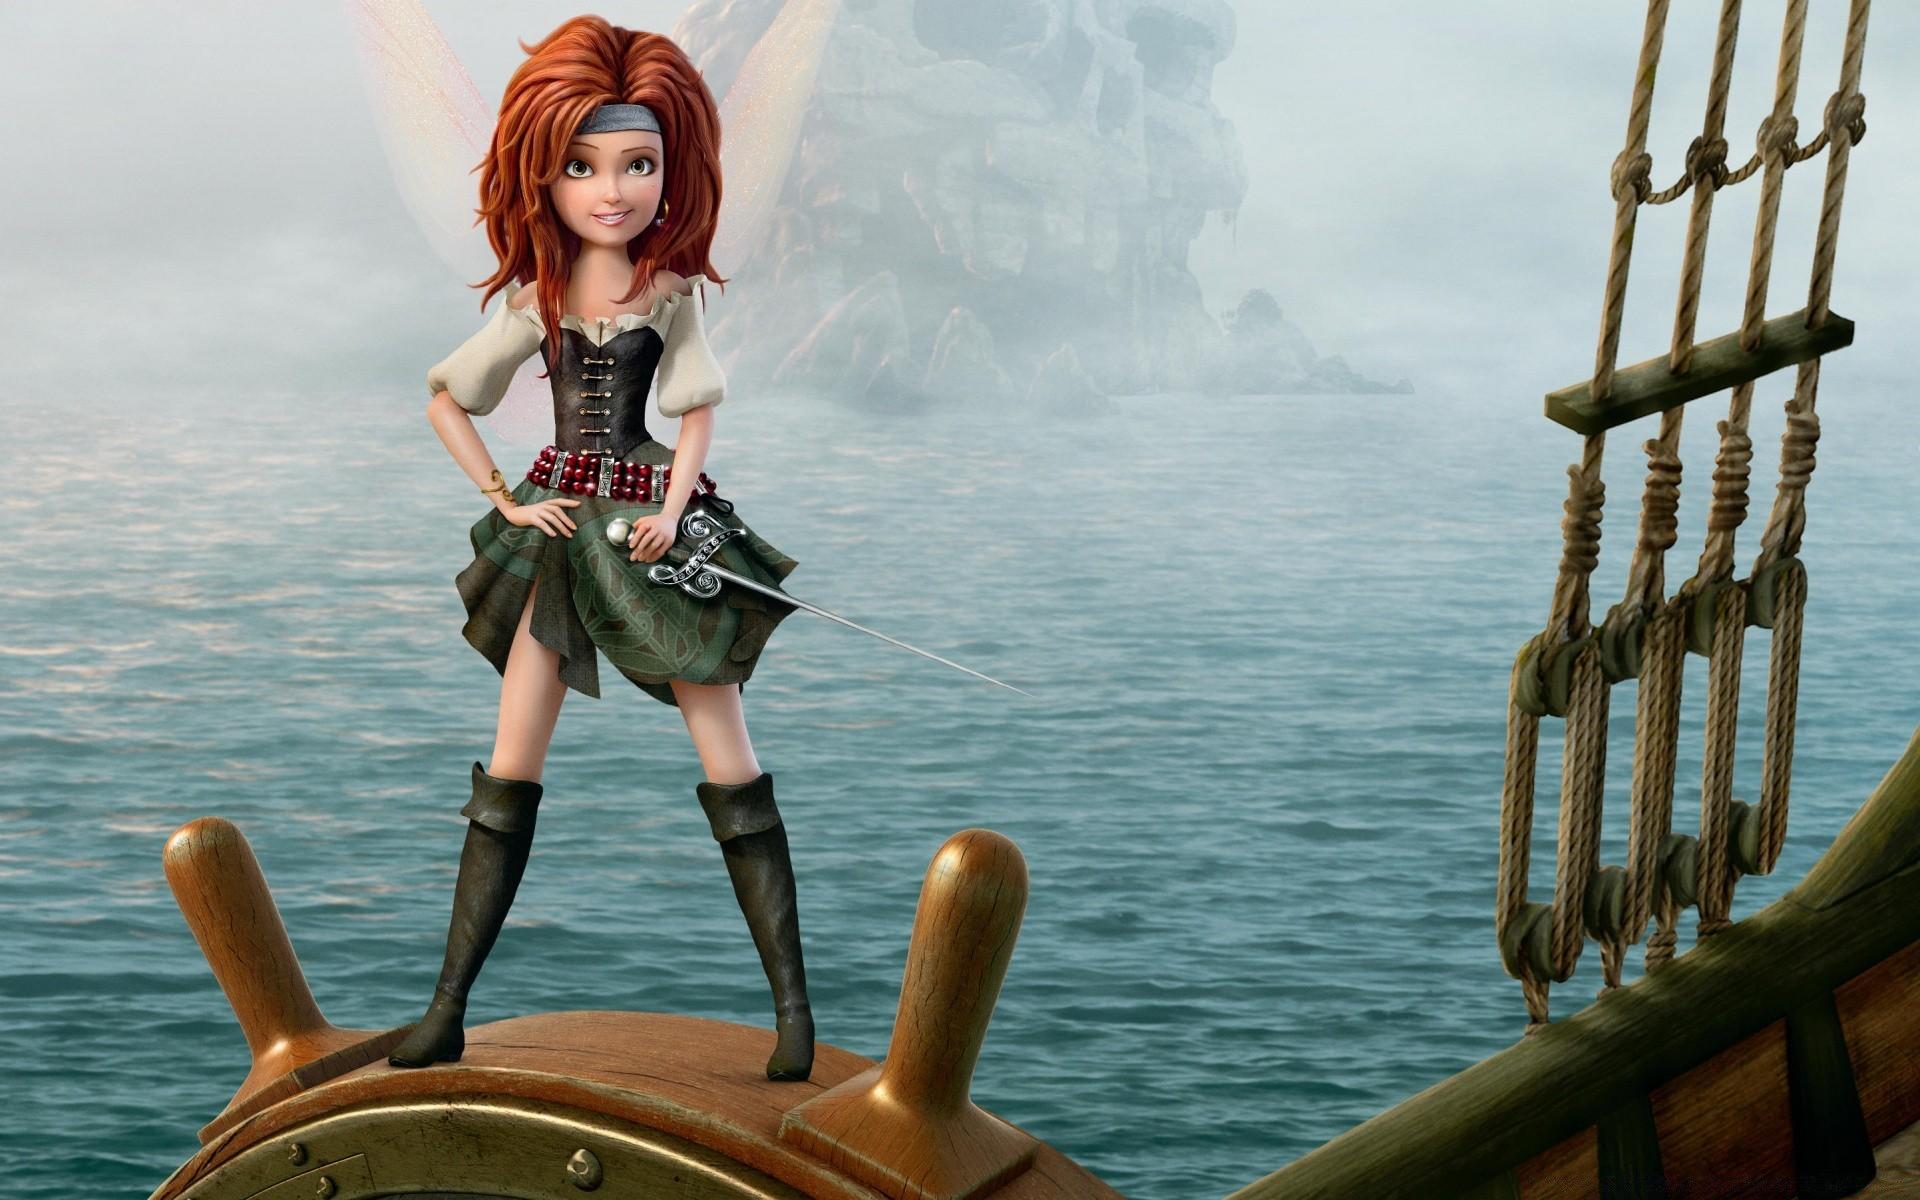 Мультик феи пиратского острова картинки